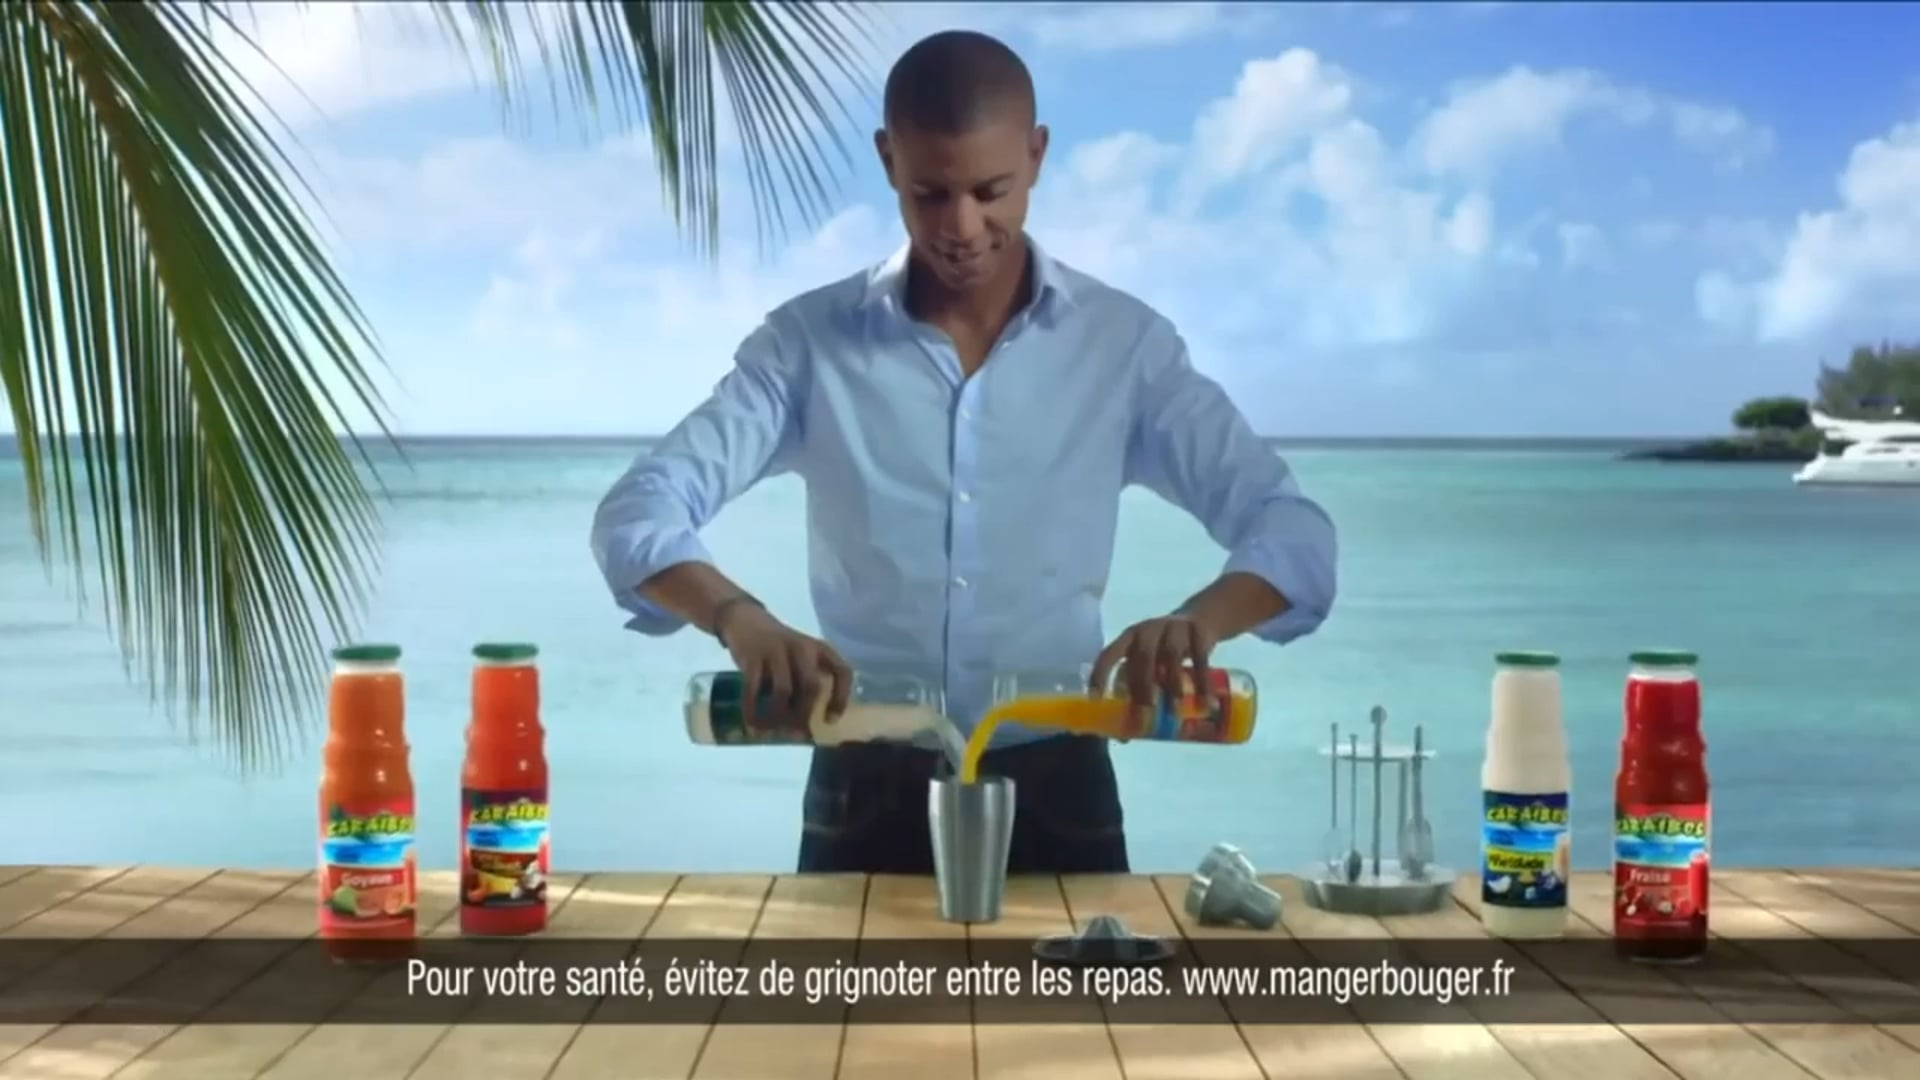 CARAIBOS commercial